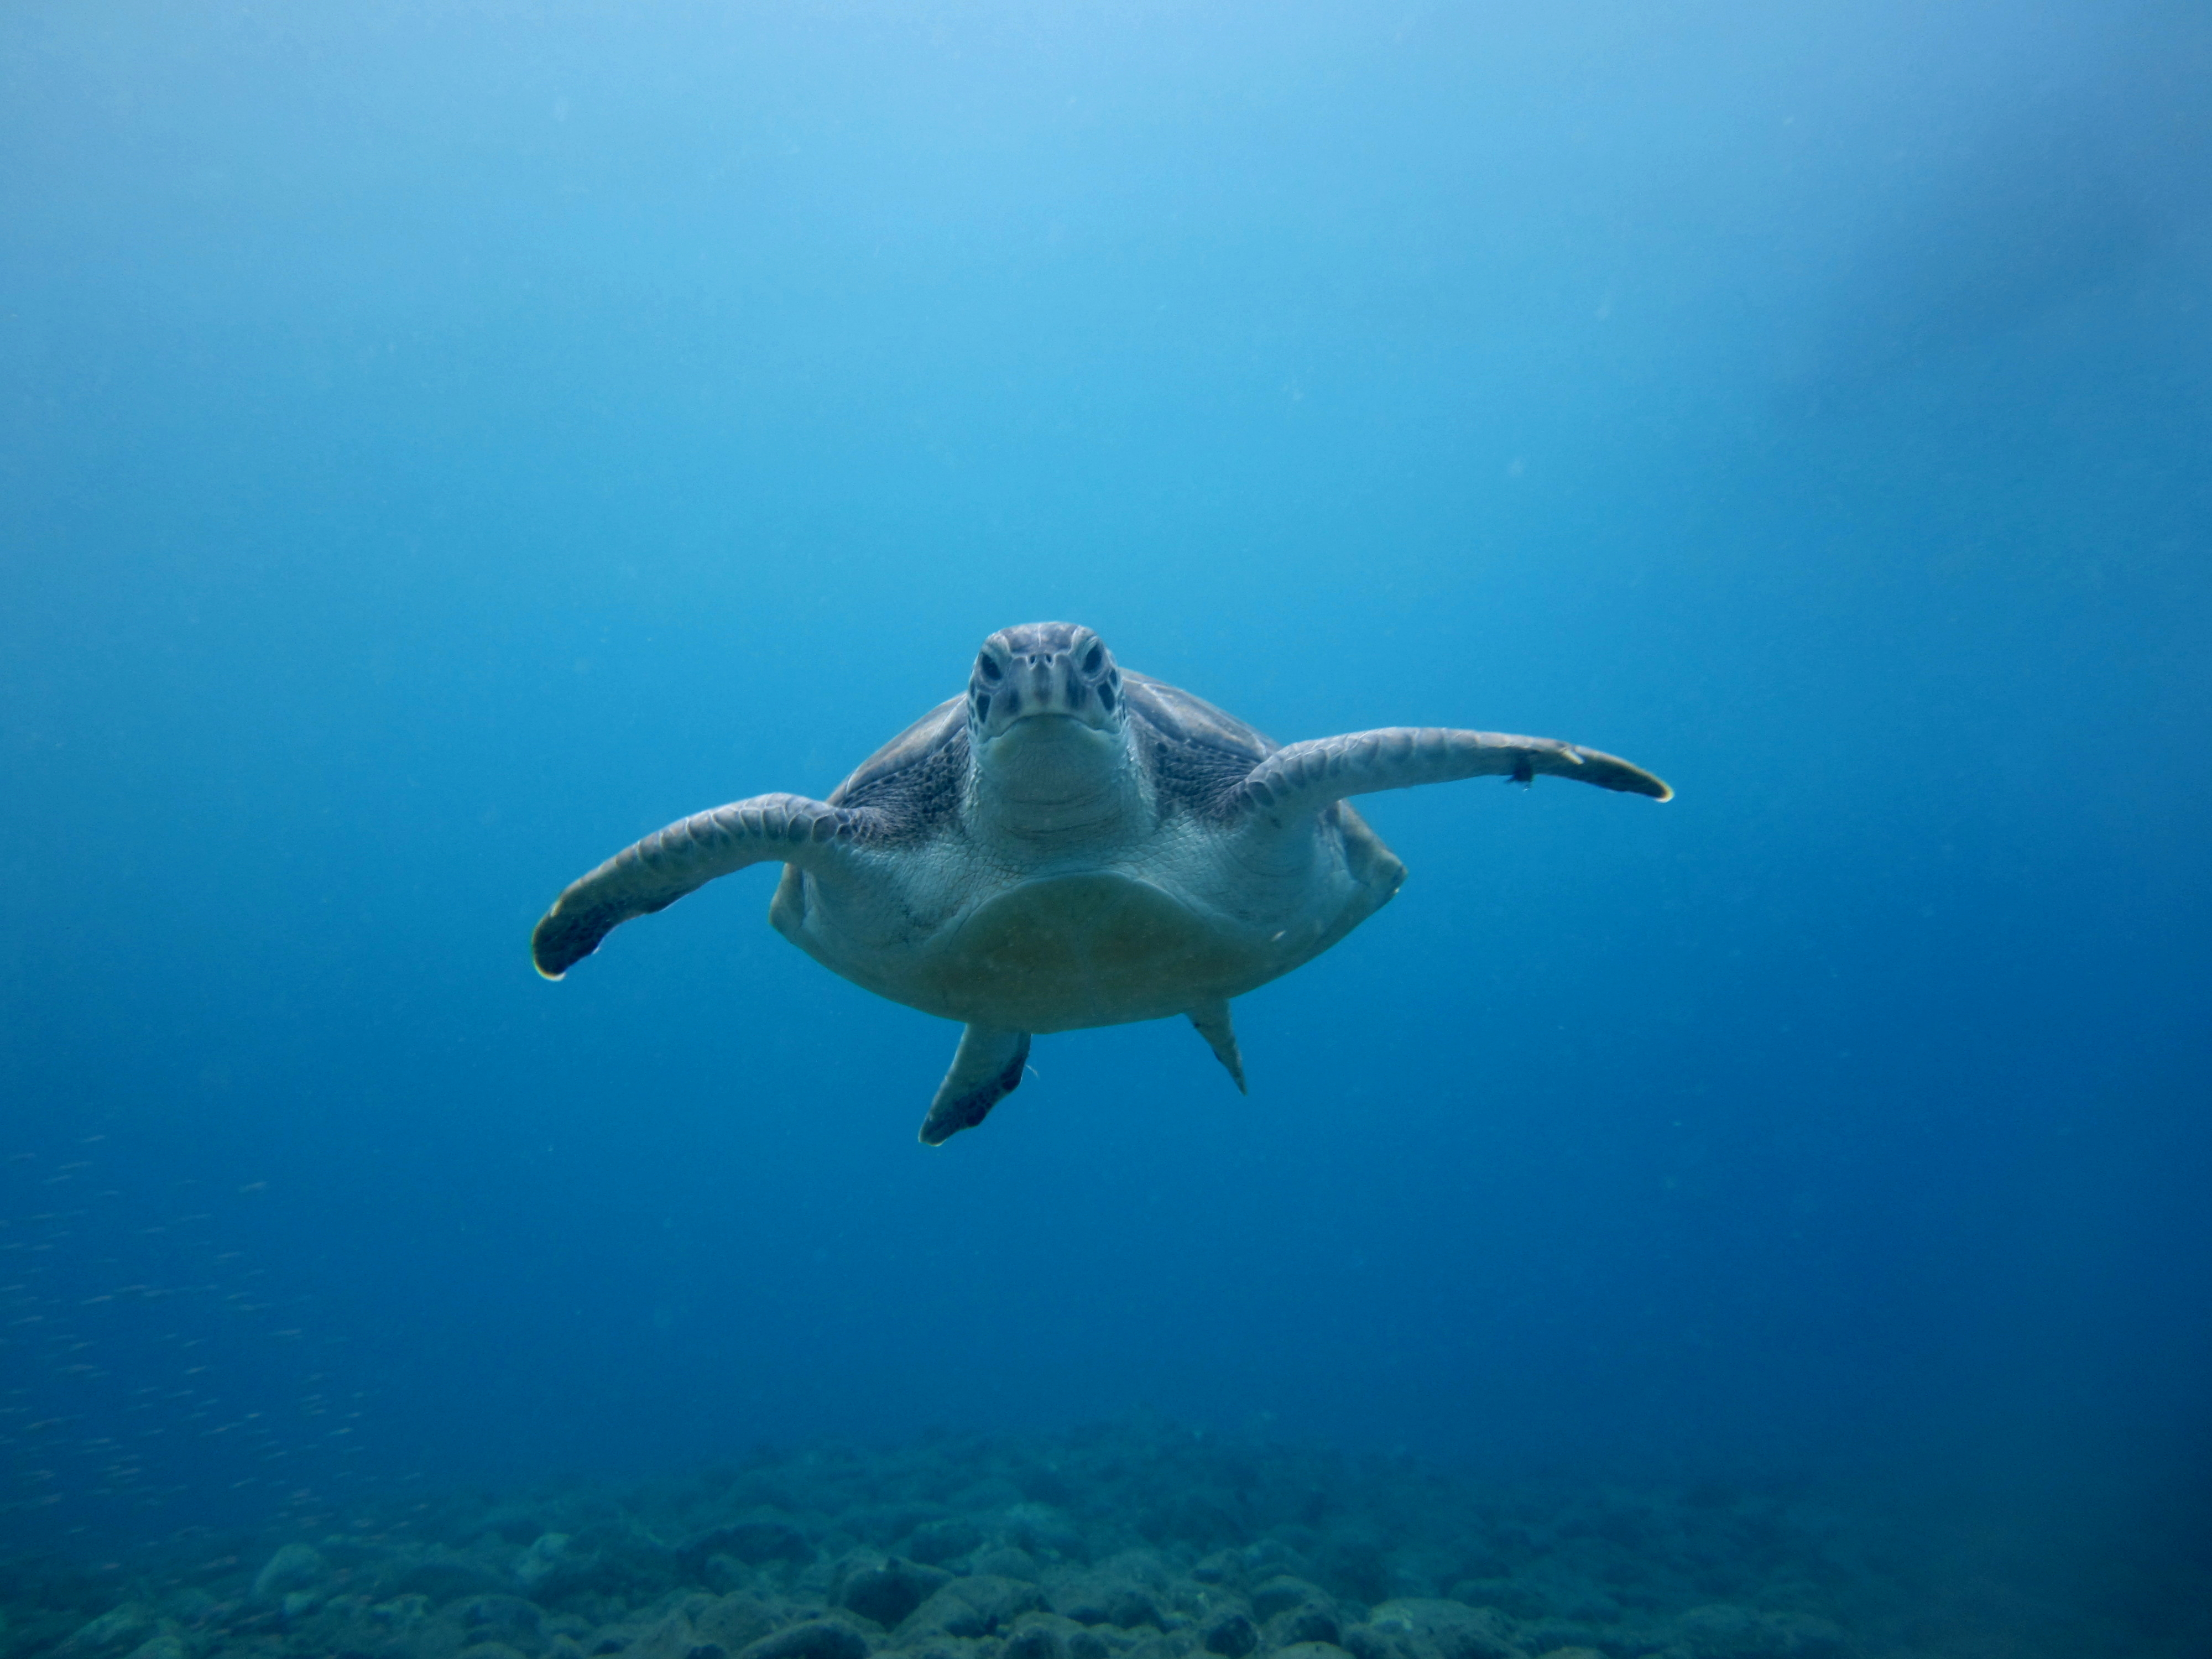 Diving-Tenerife-Aquatic-Life-Sharks-Sting-Rays-Fish (24)